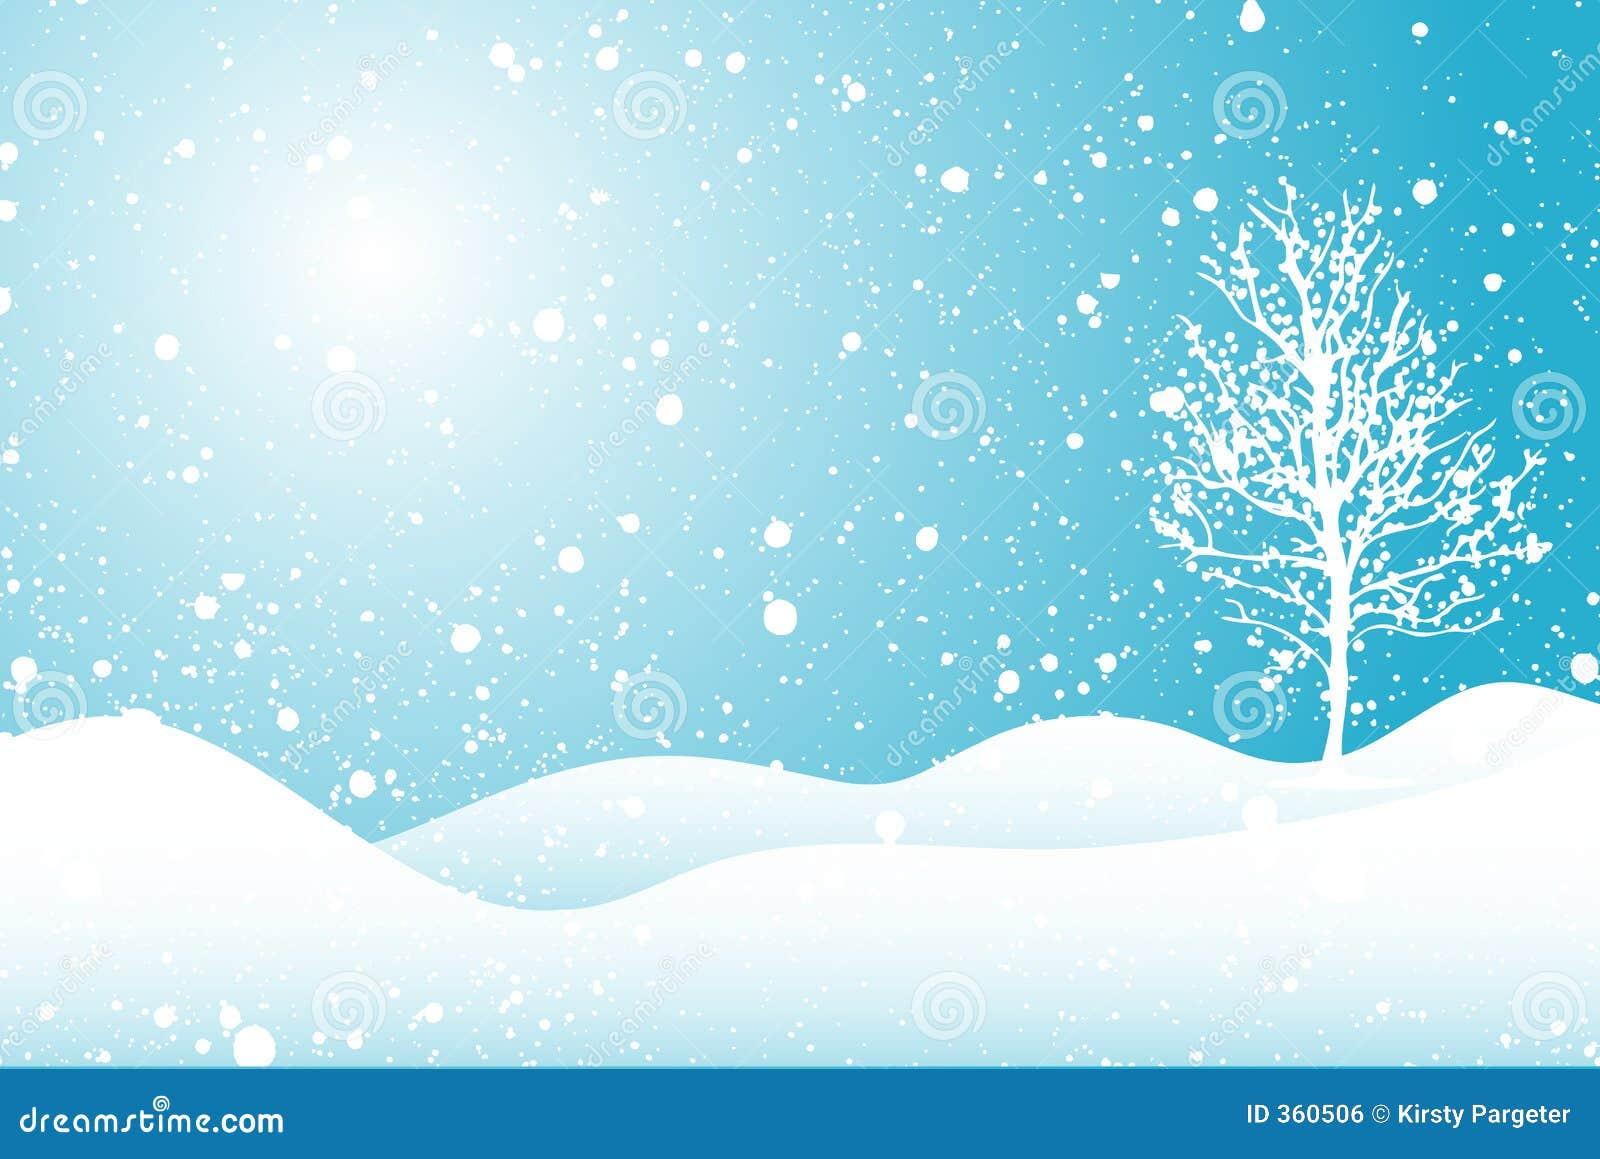 Snowy Scene Royalty Free Stock Image - Image: 360506